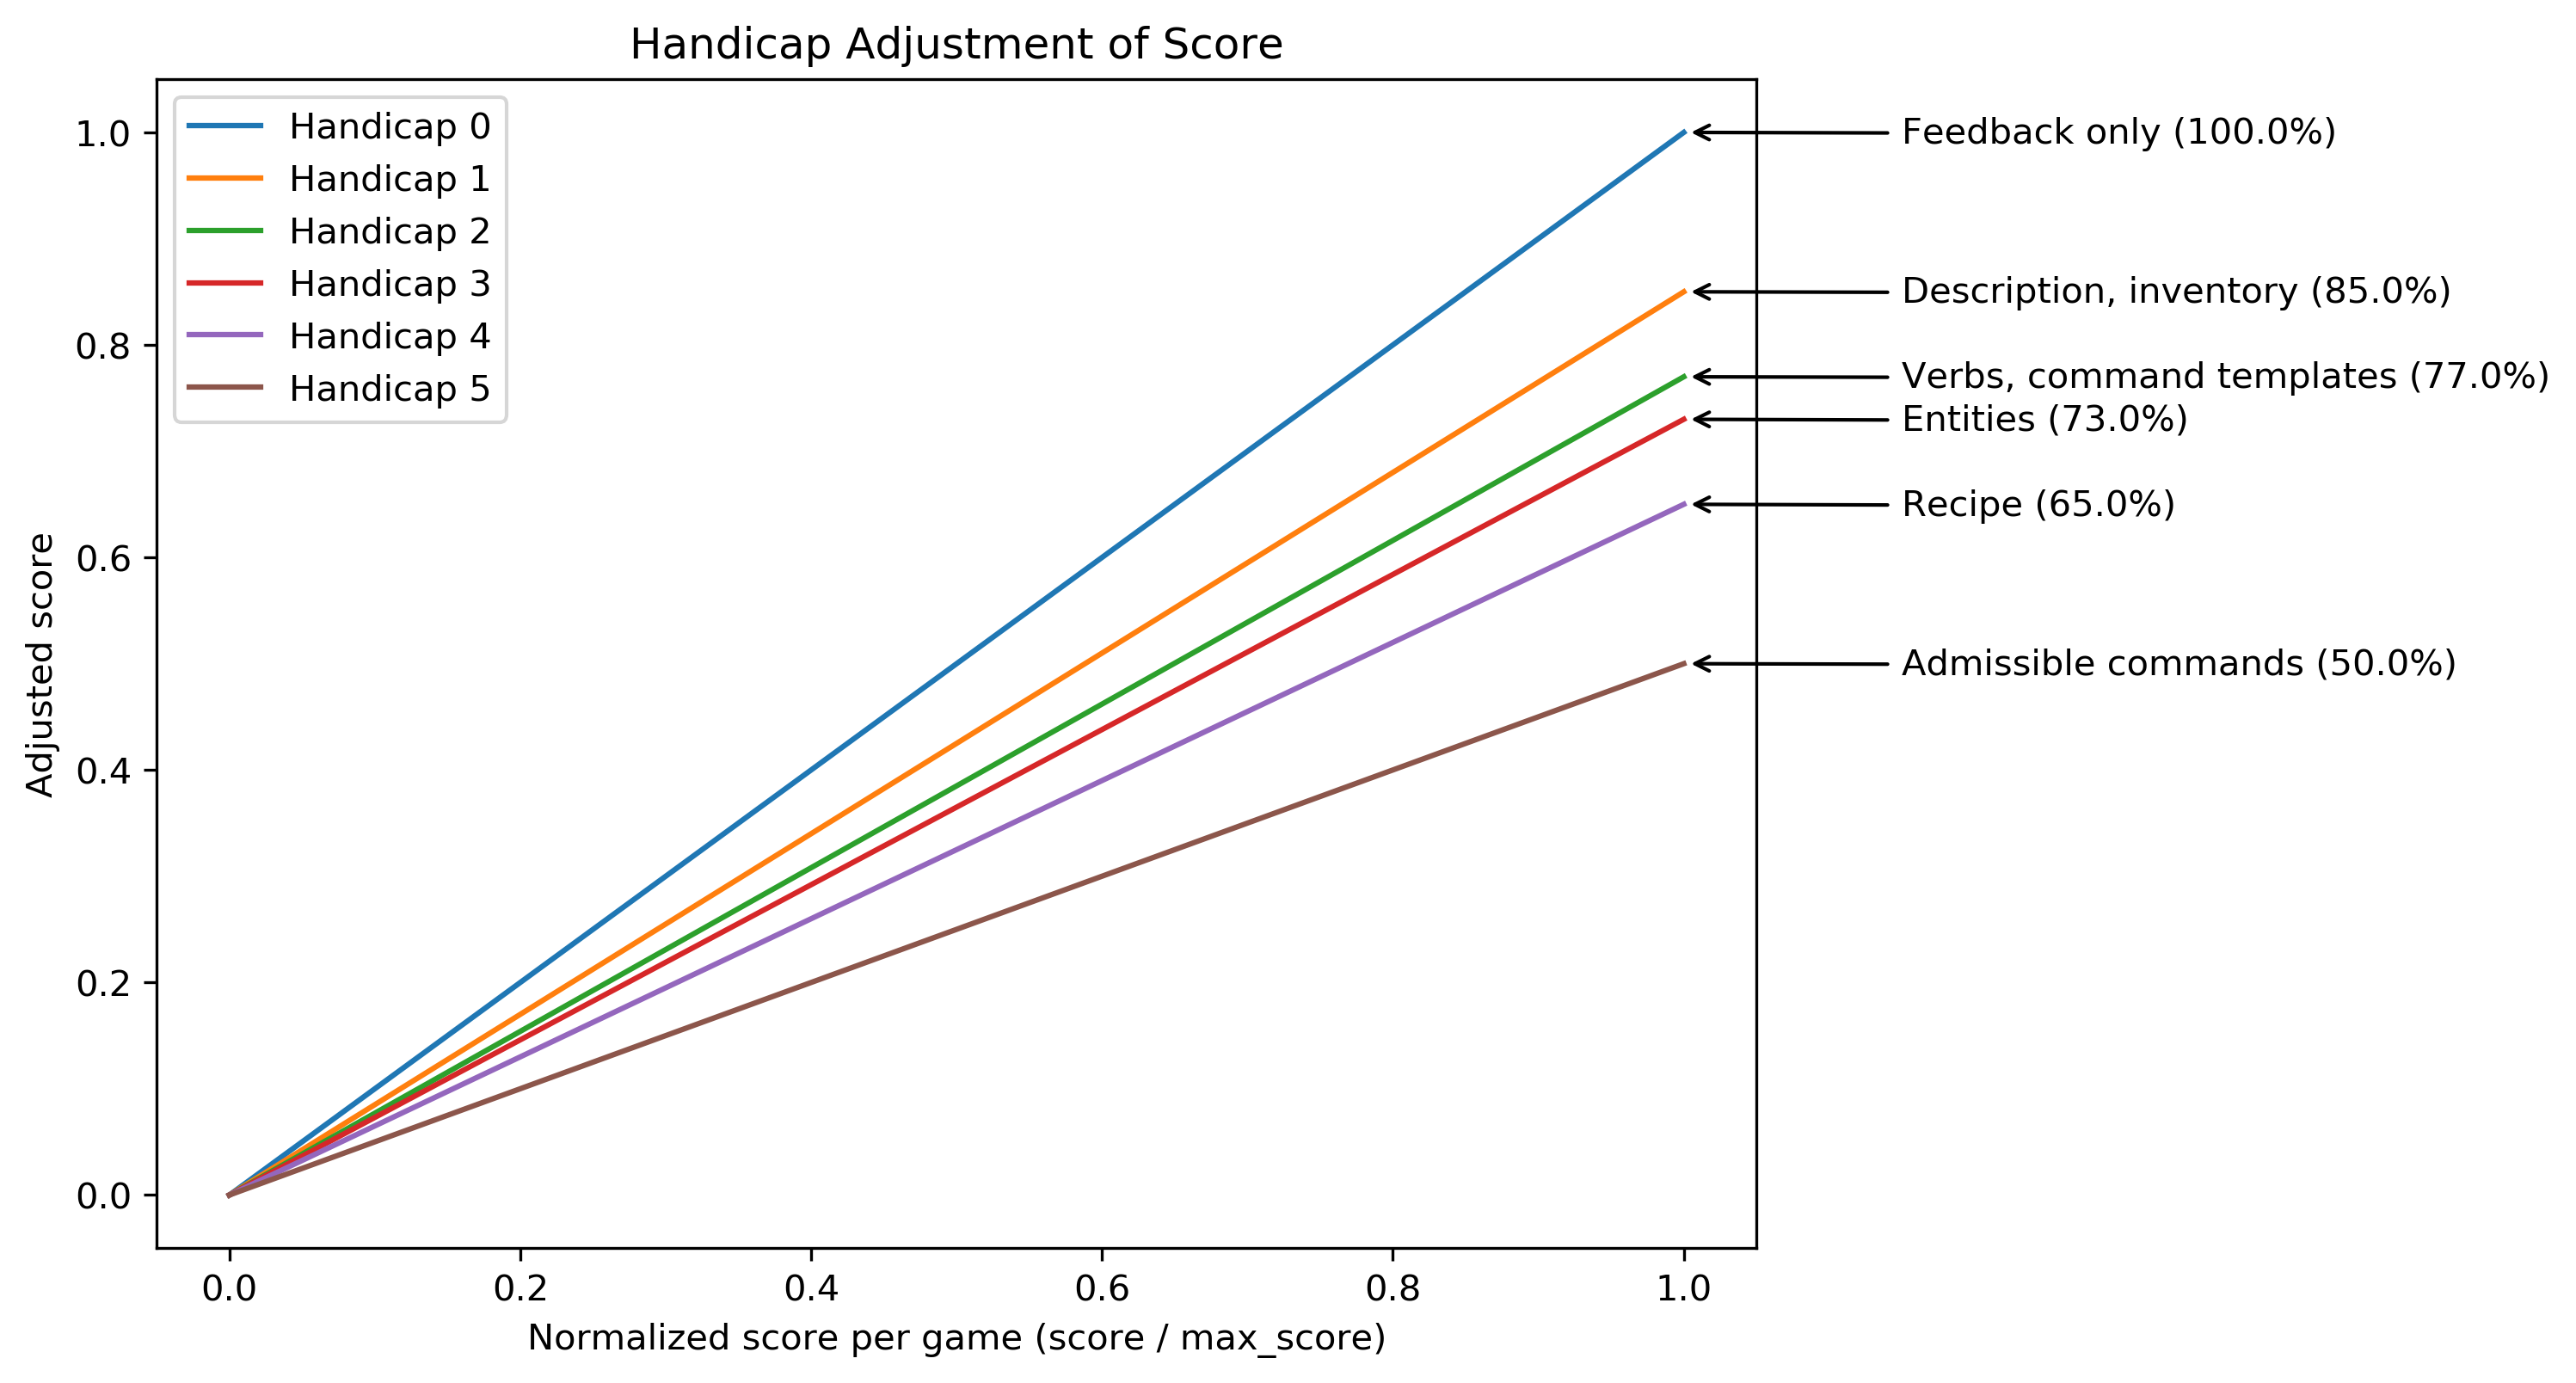 Adjusted score